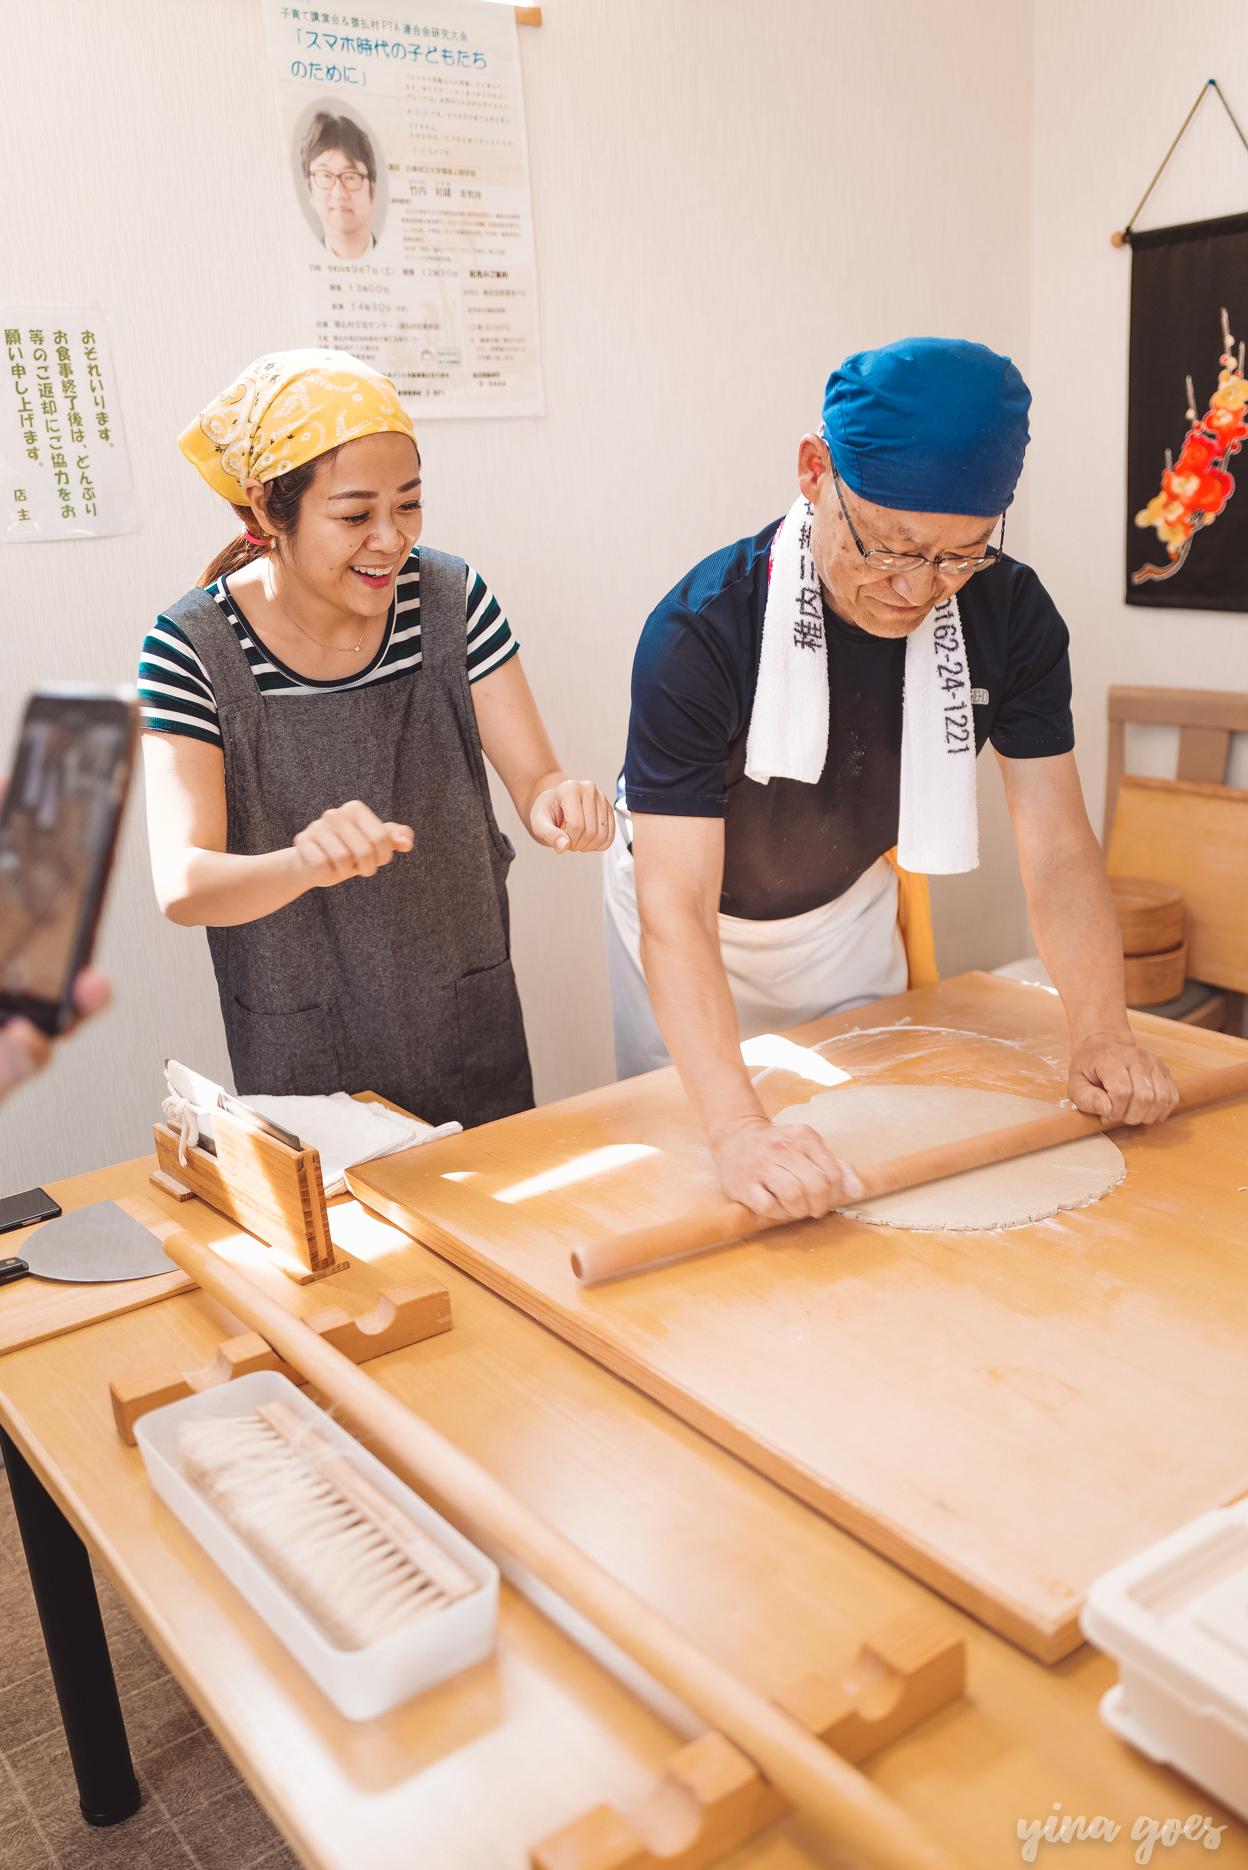 Soba-making experience in Wakkanai